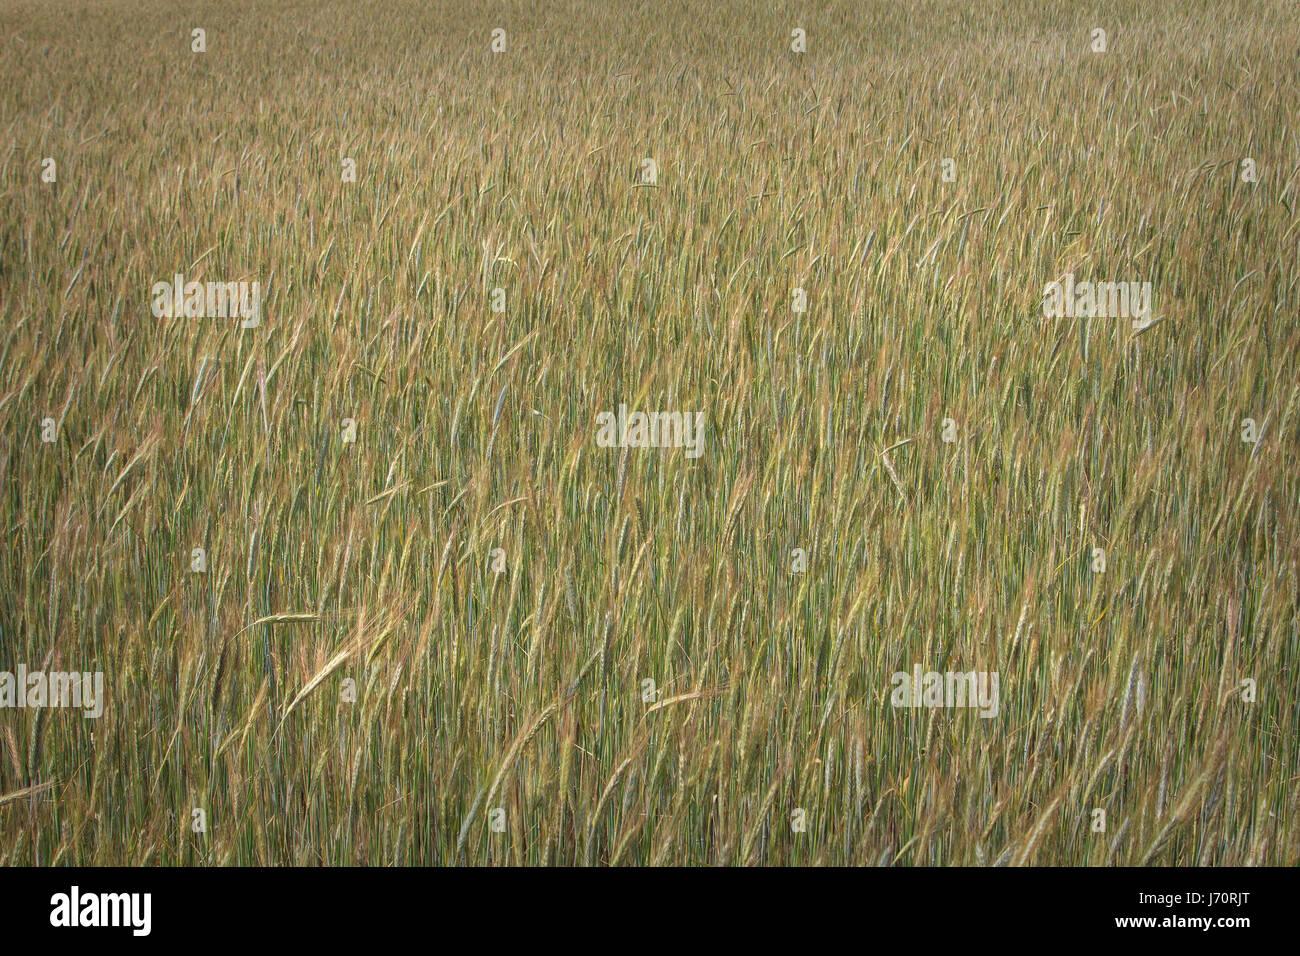 Wheat field Virginia USA - Stock Image